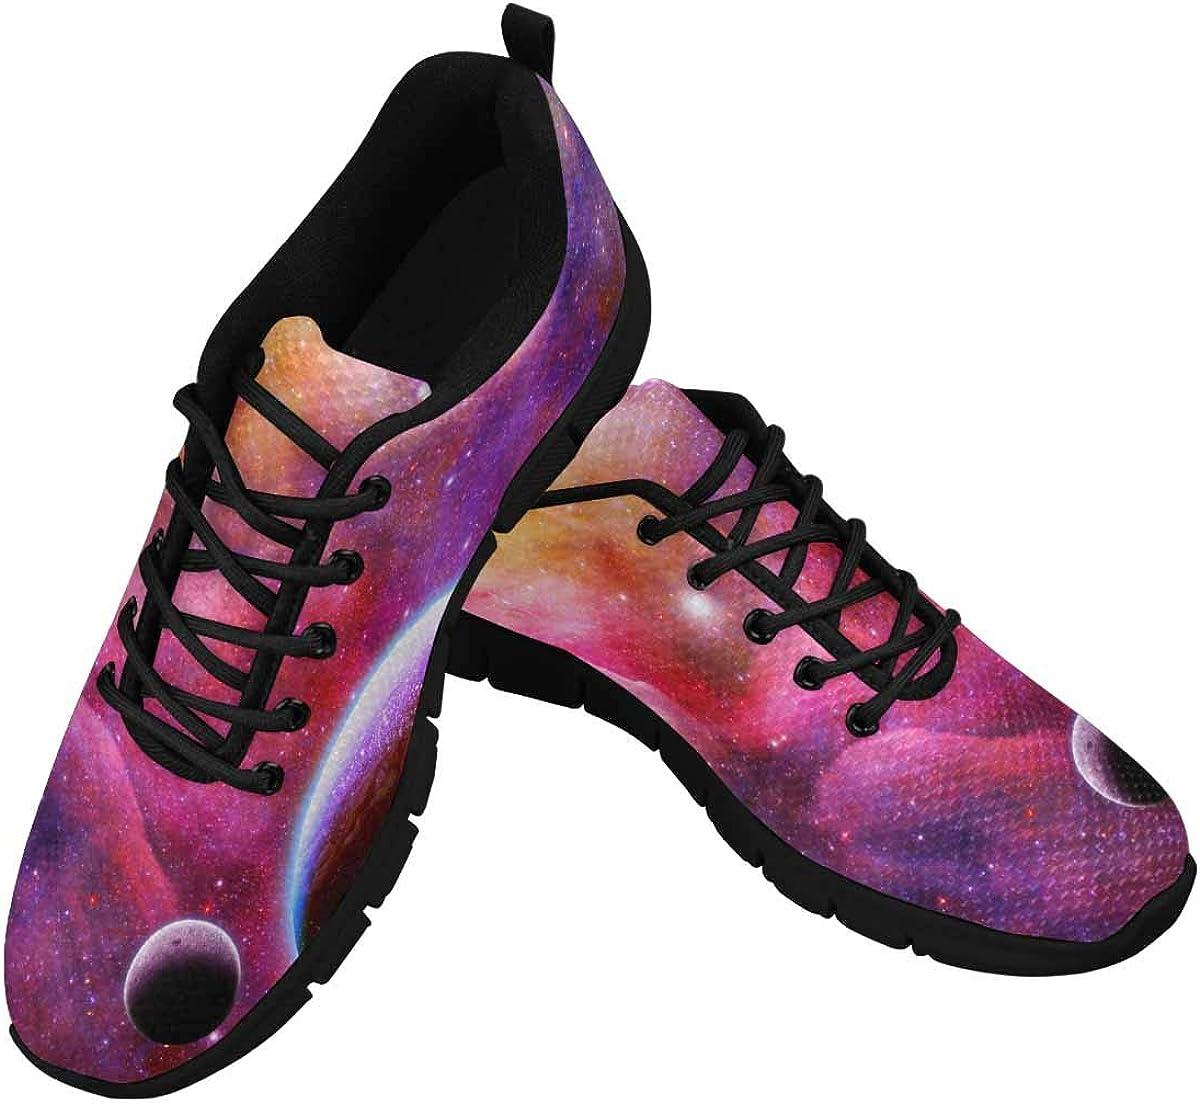 INTERESTPRINT Galaxy and Nebula Pattern Women's Athletic Walking Shoes Breathe Comfort Mesh